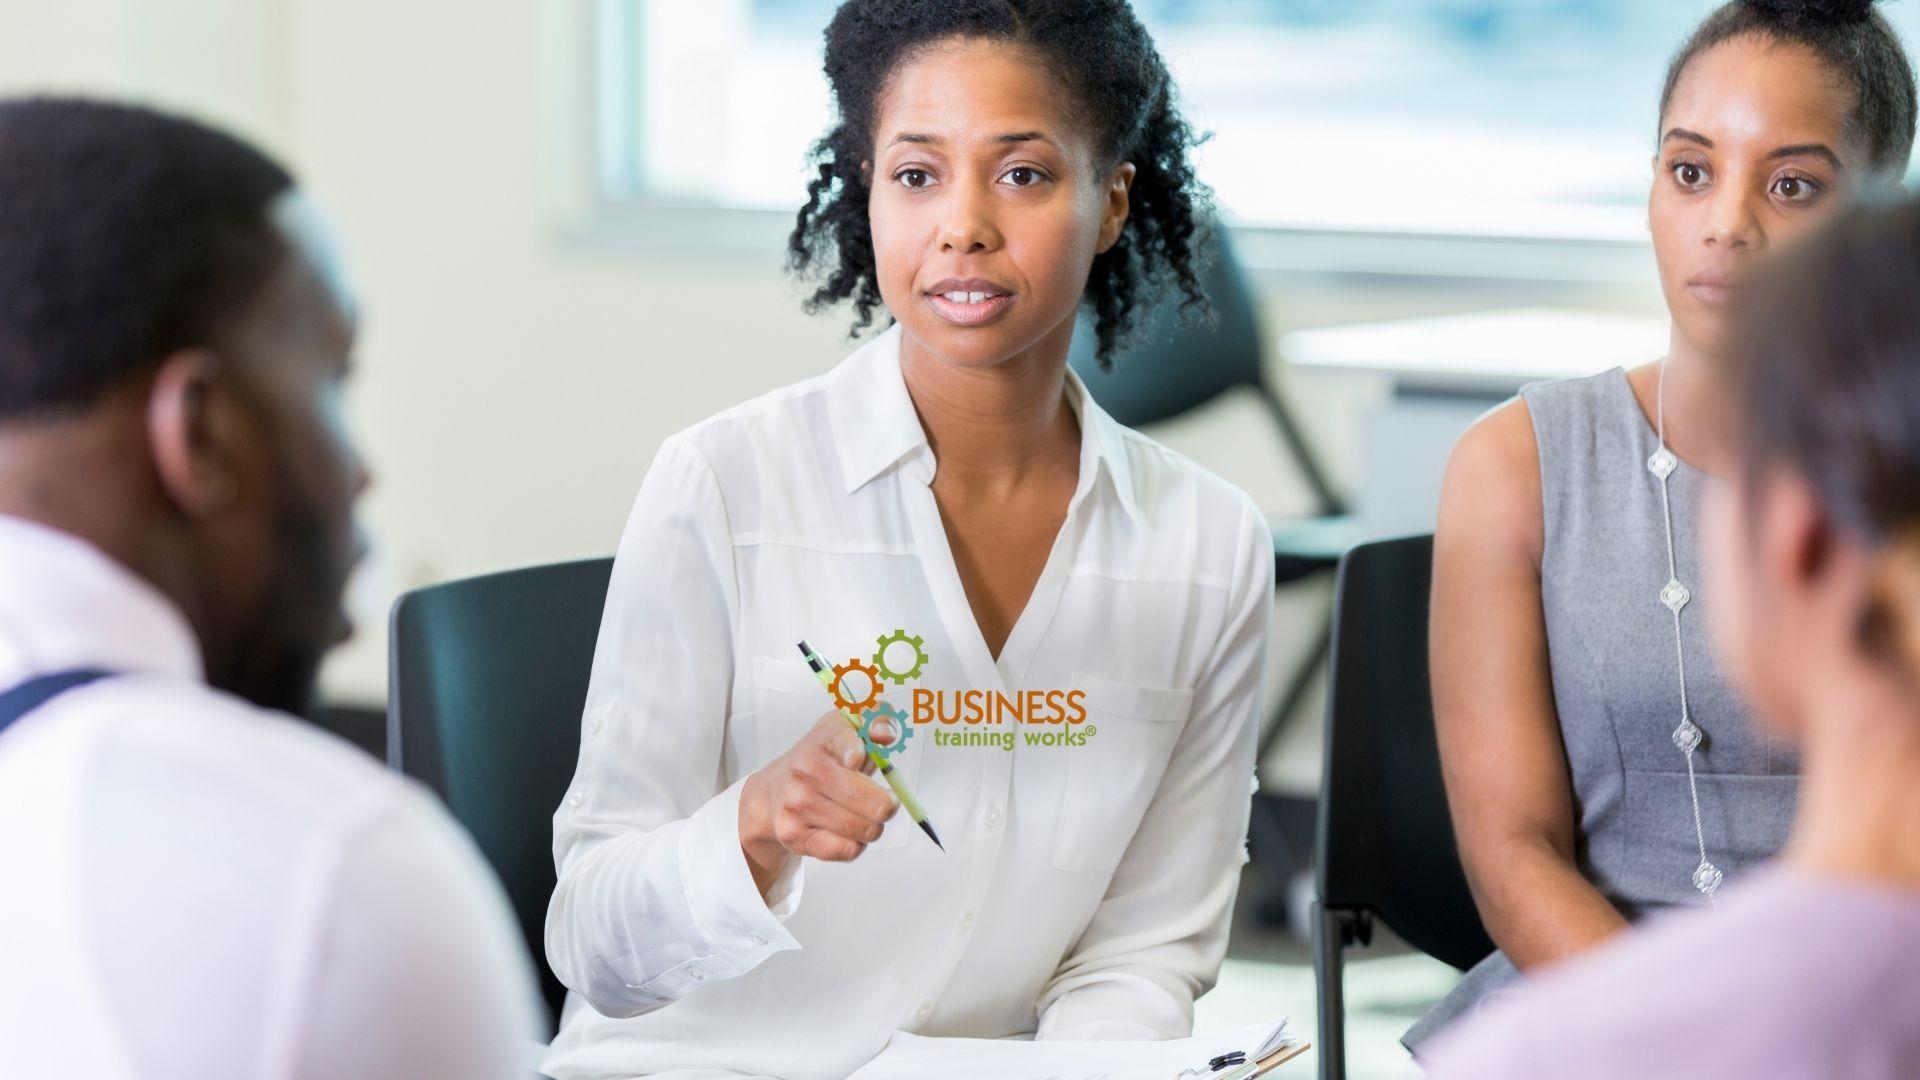 Web-Based Facilitation Skills Training for Affinity Group Facilitators